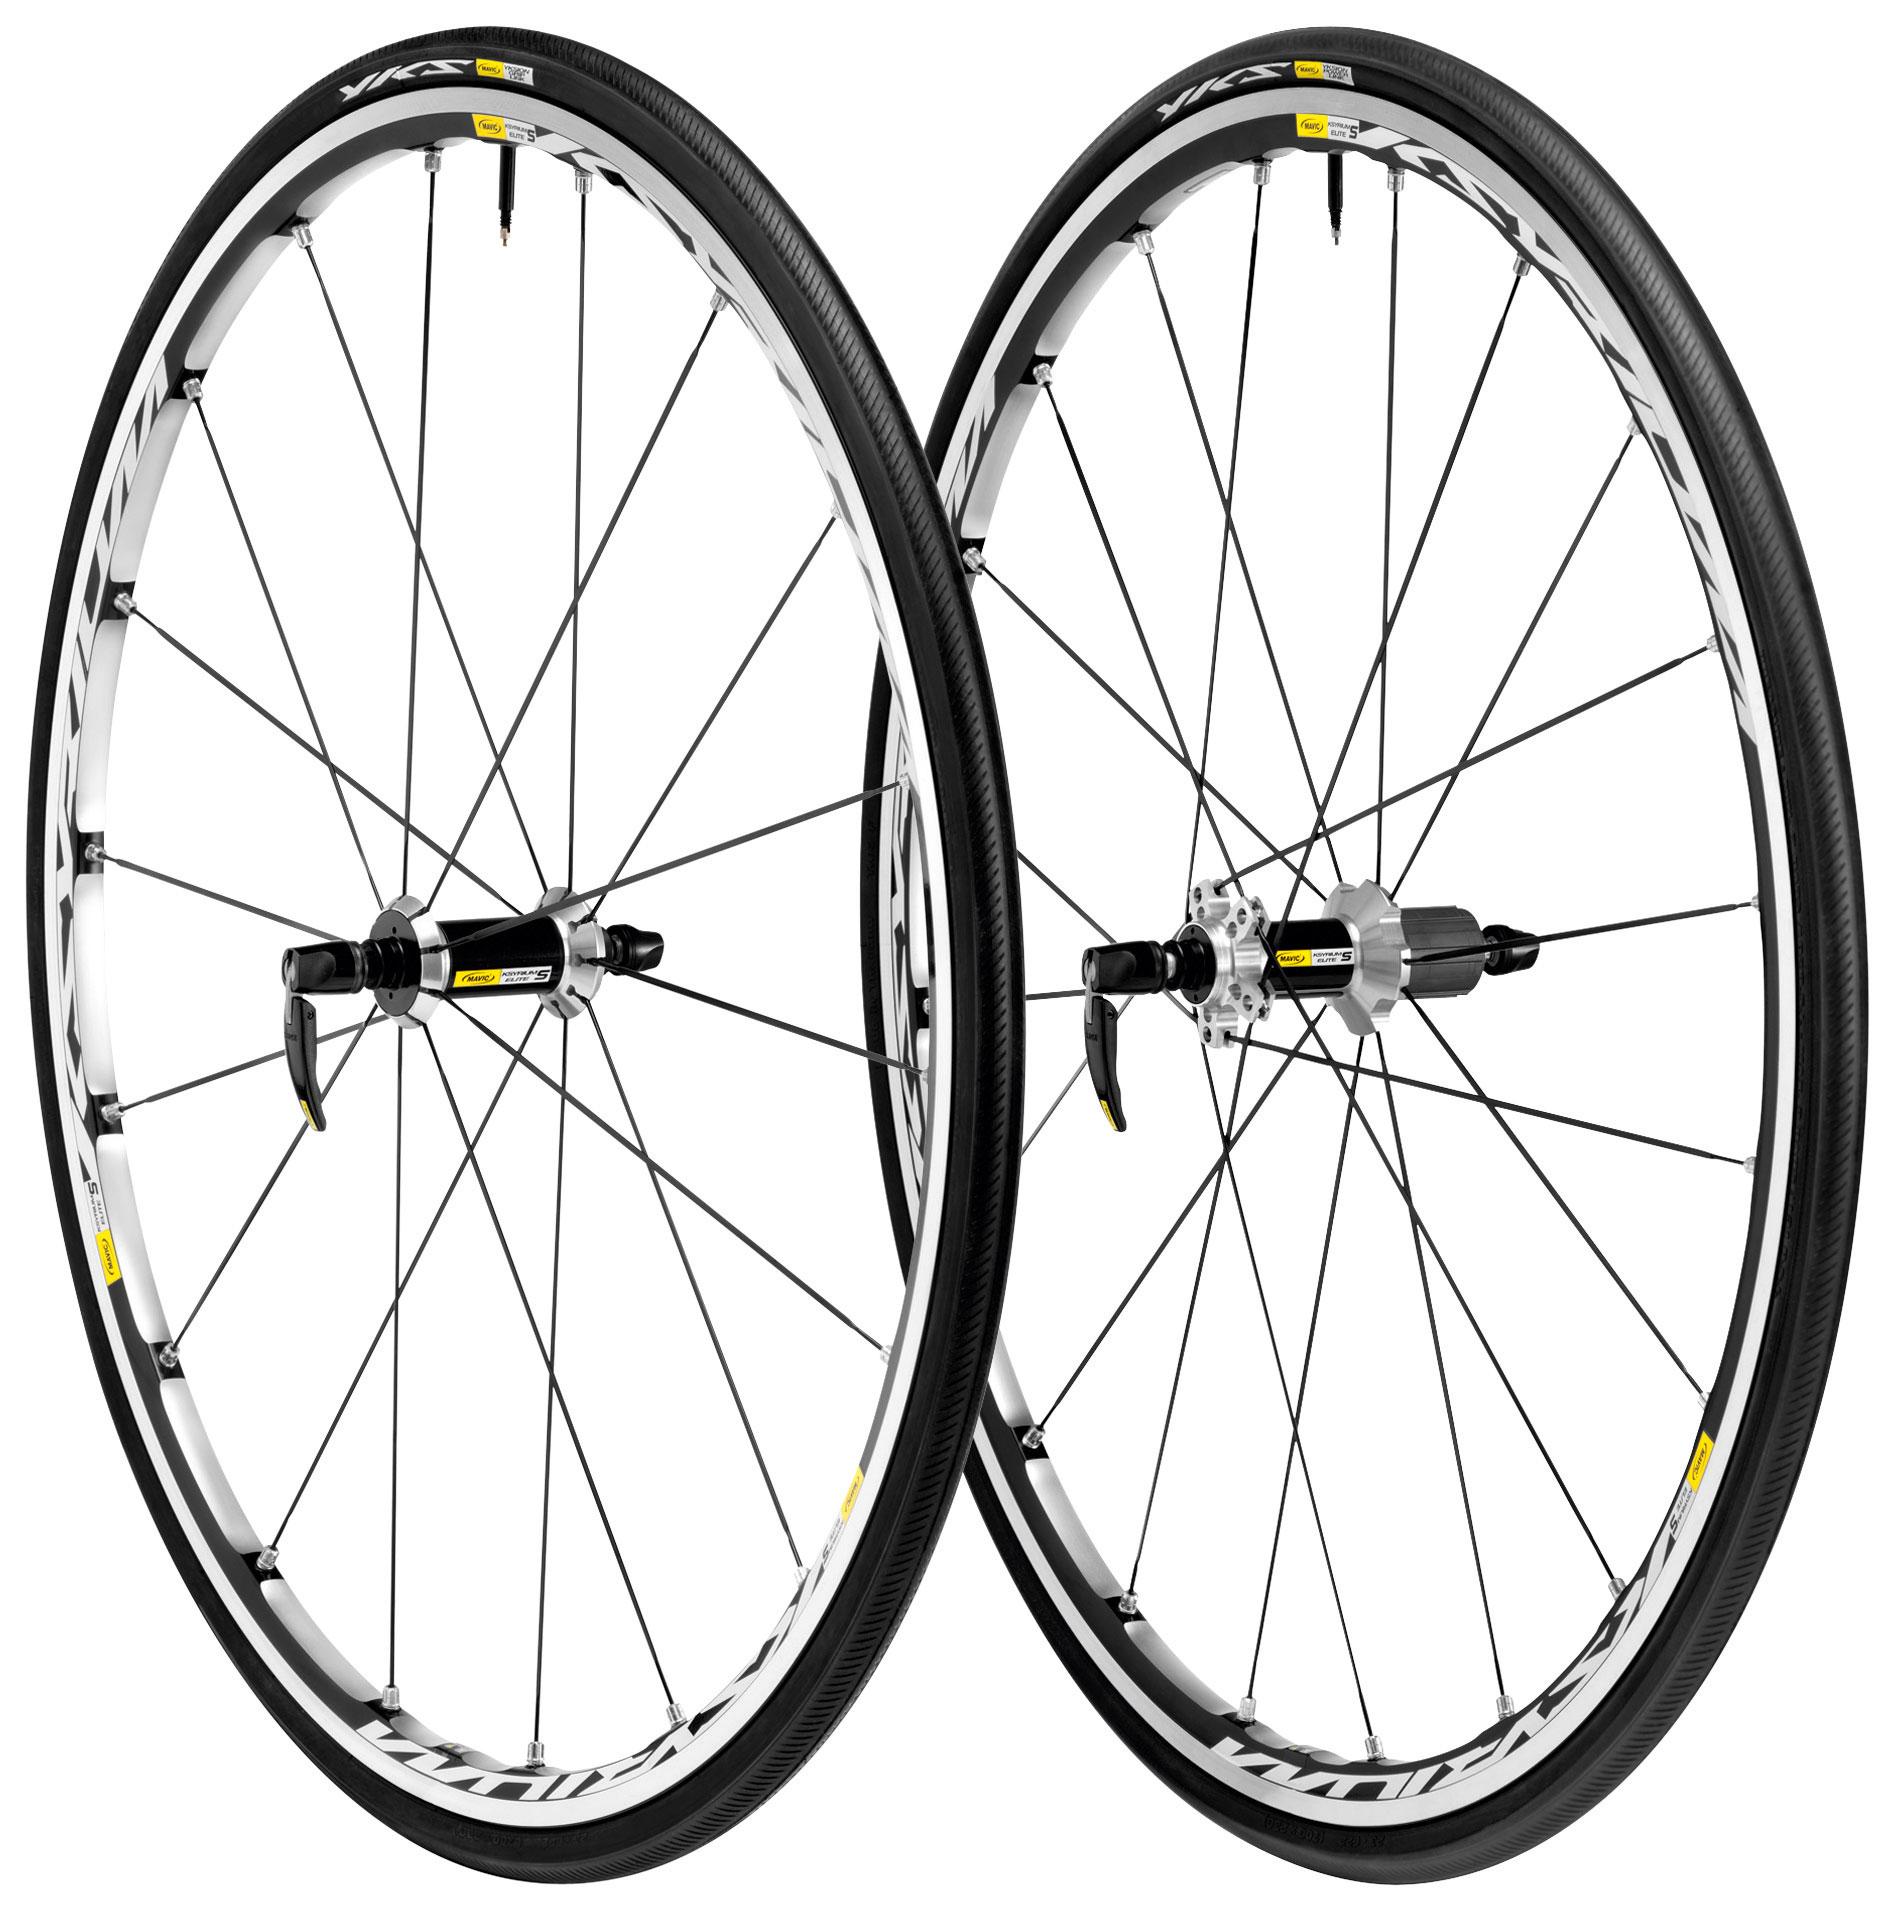 Mavic Ksyrium Elite S Wheel Tire Set